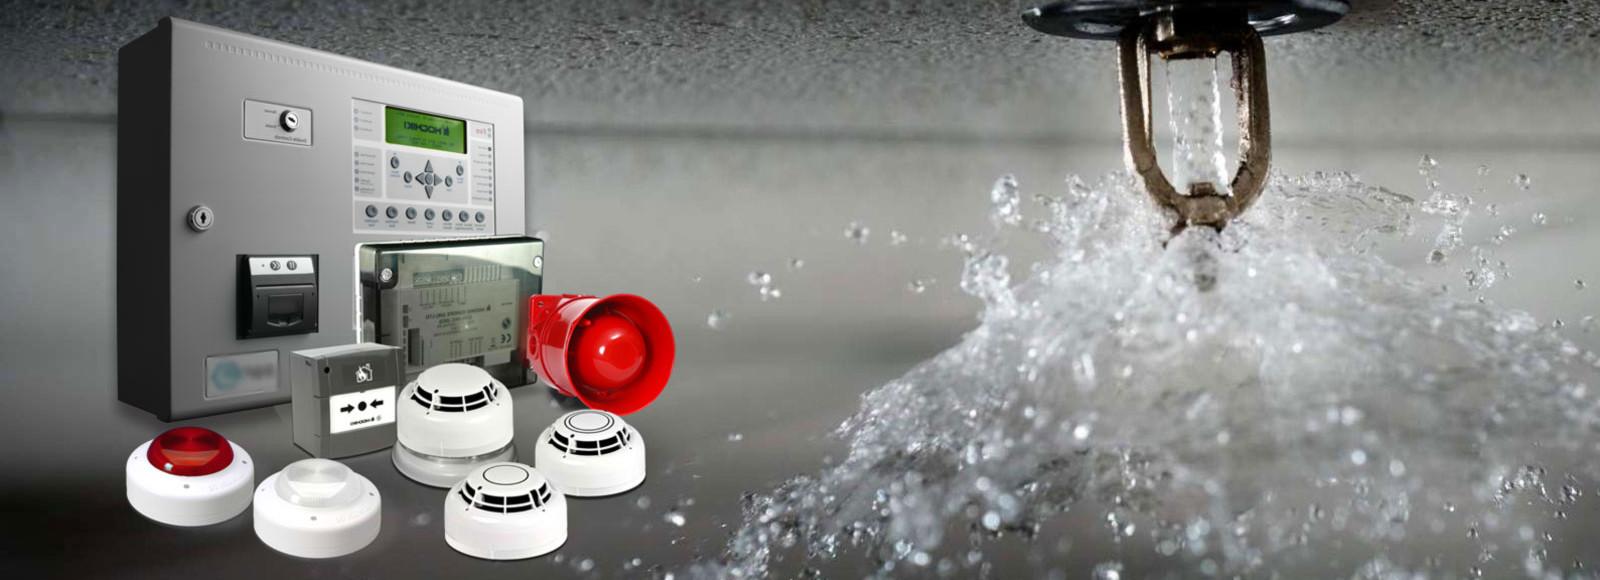 Fire Alarm Systems Chennai India